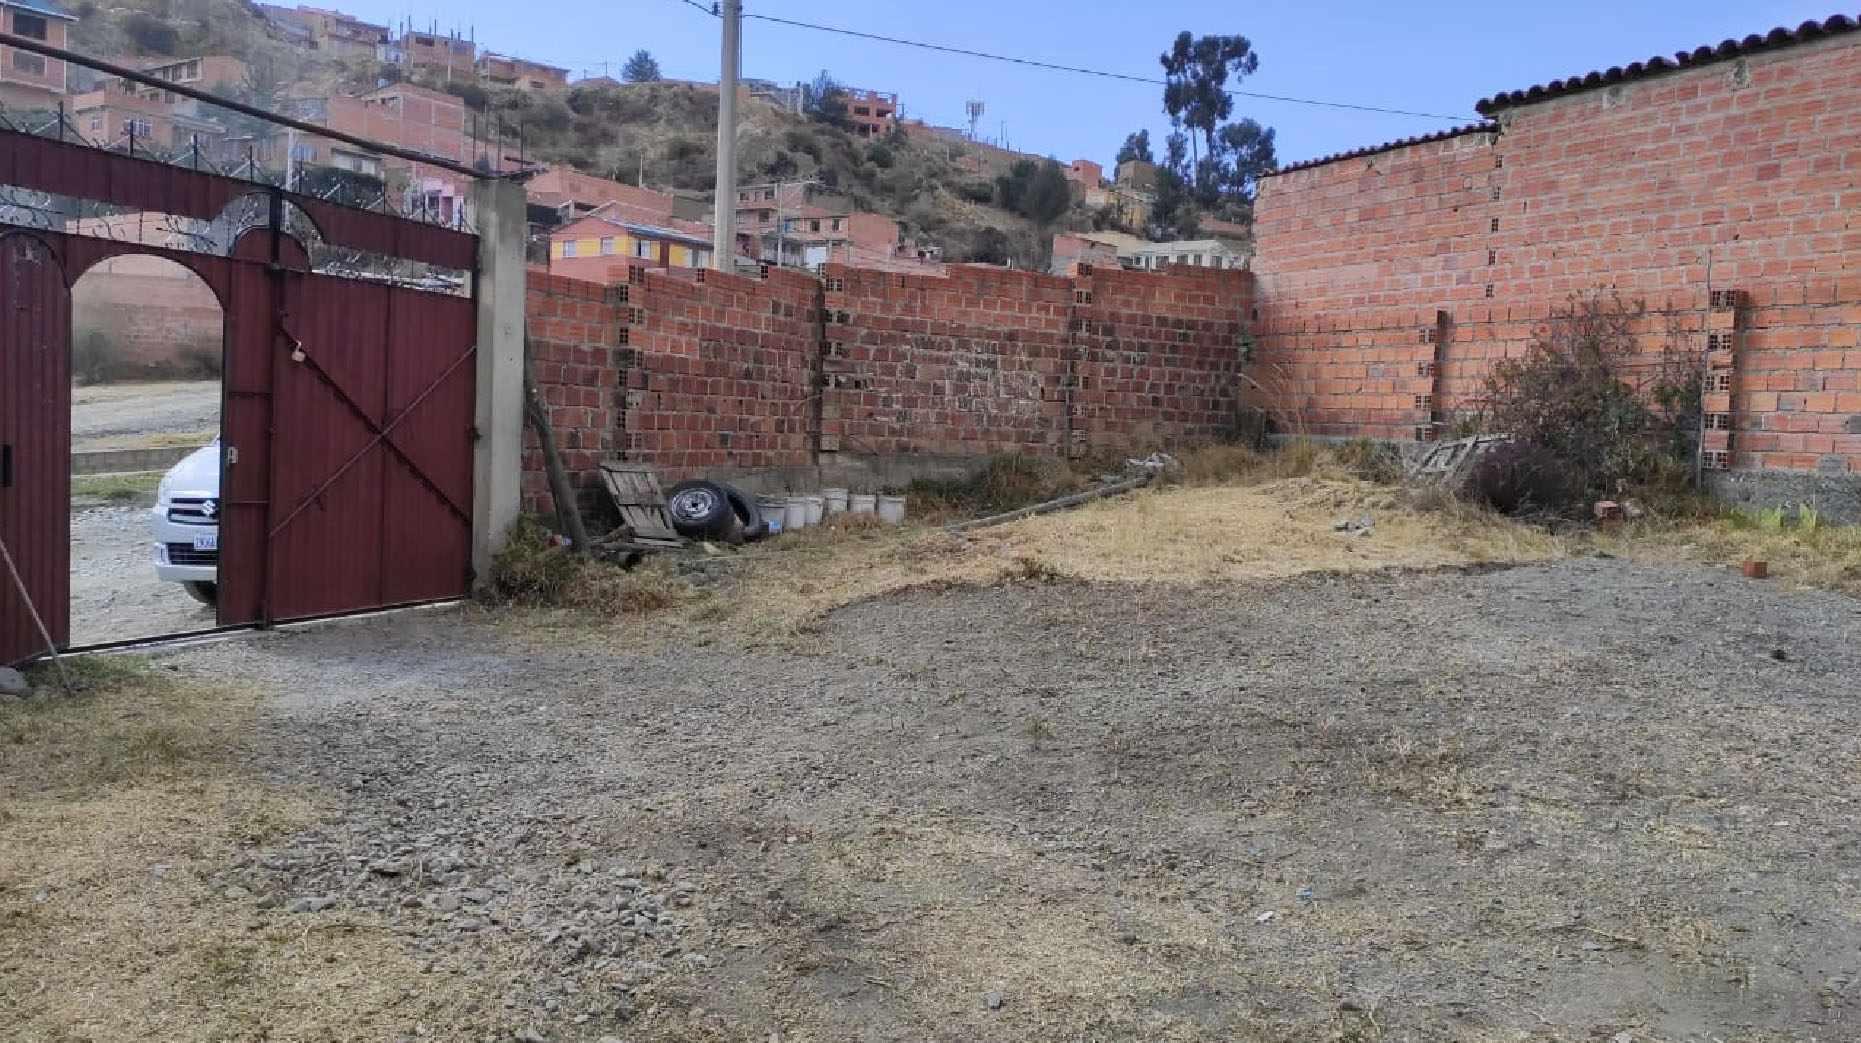 Terreno en Alquiler Av. Costanera Jilusaya, ingreso por la calle 58, zona de Chasquipampa Foto 3